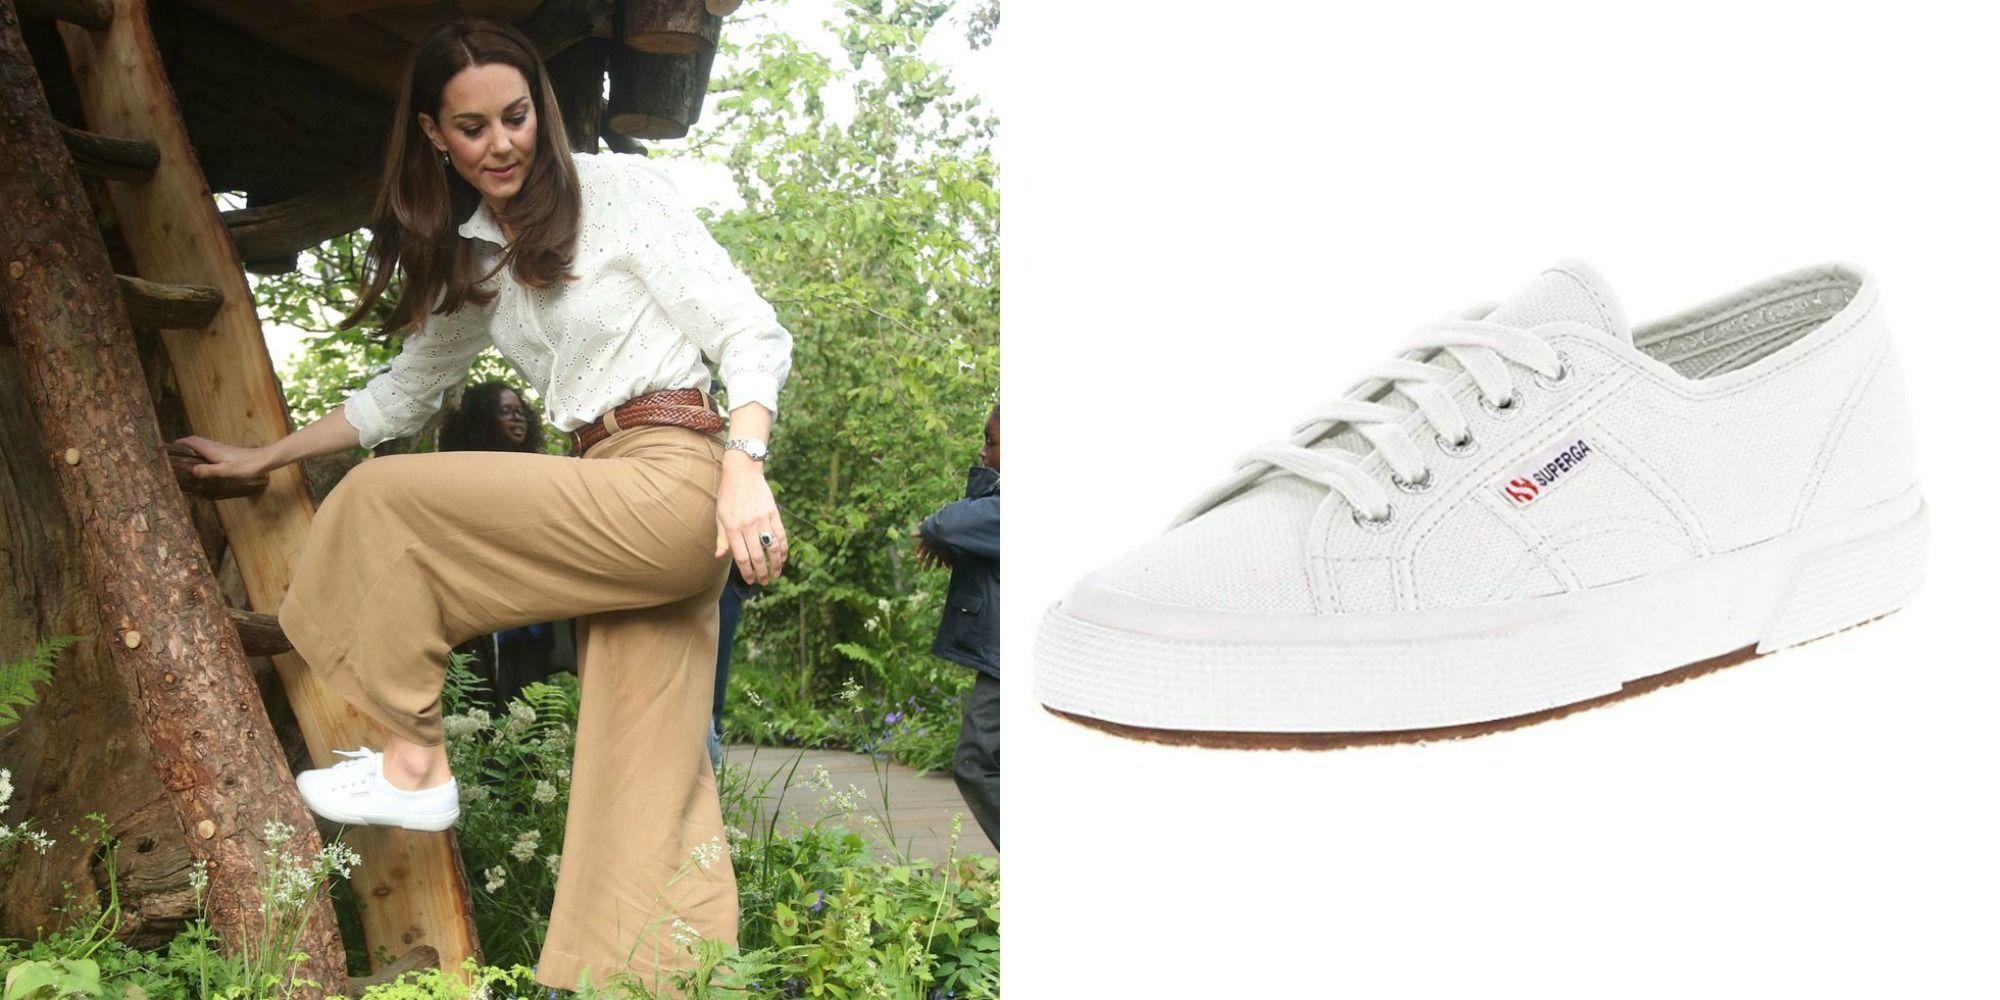 Kate Middleton's Superga Cotu Sneakers